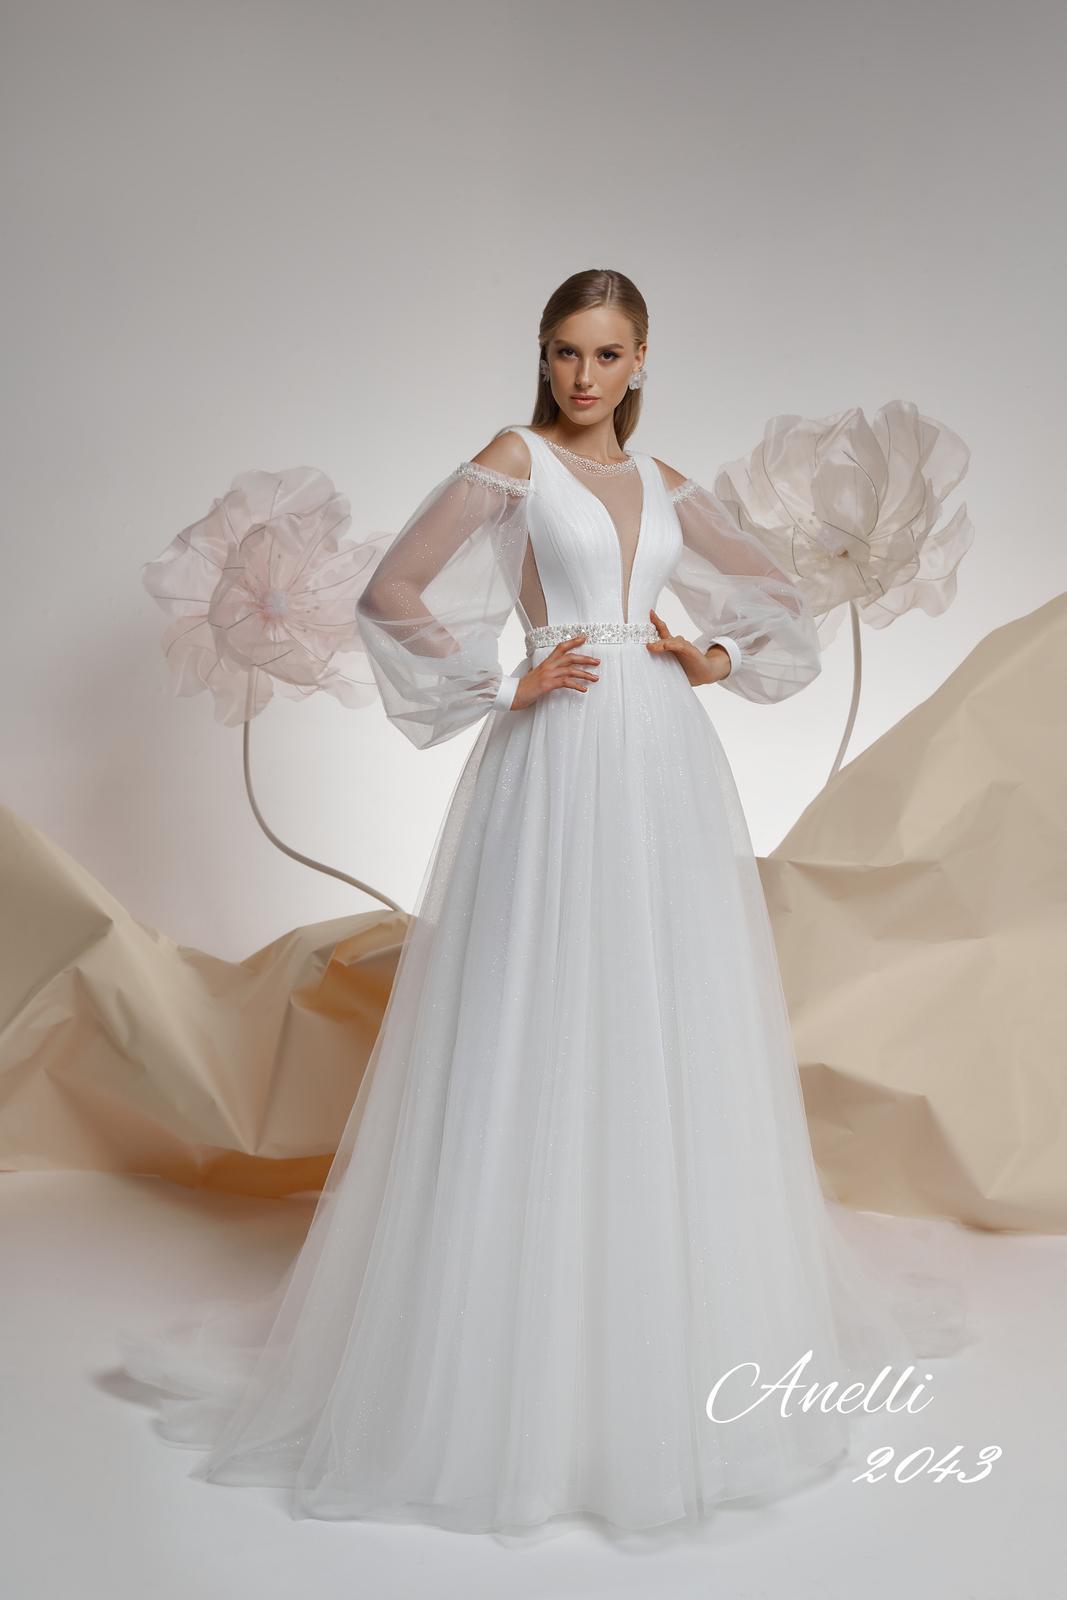 Svadobné šaty - Imagine 2043 - Obrázok č. 1